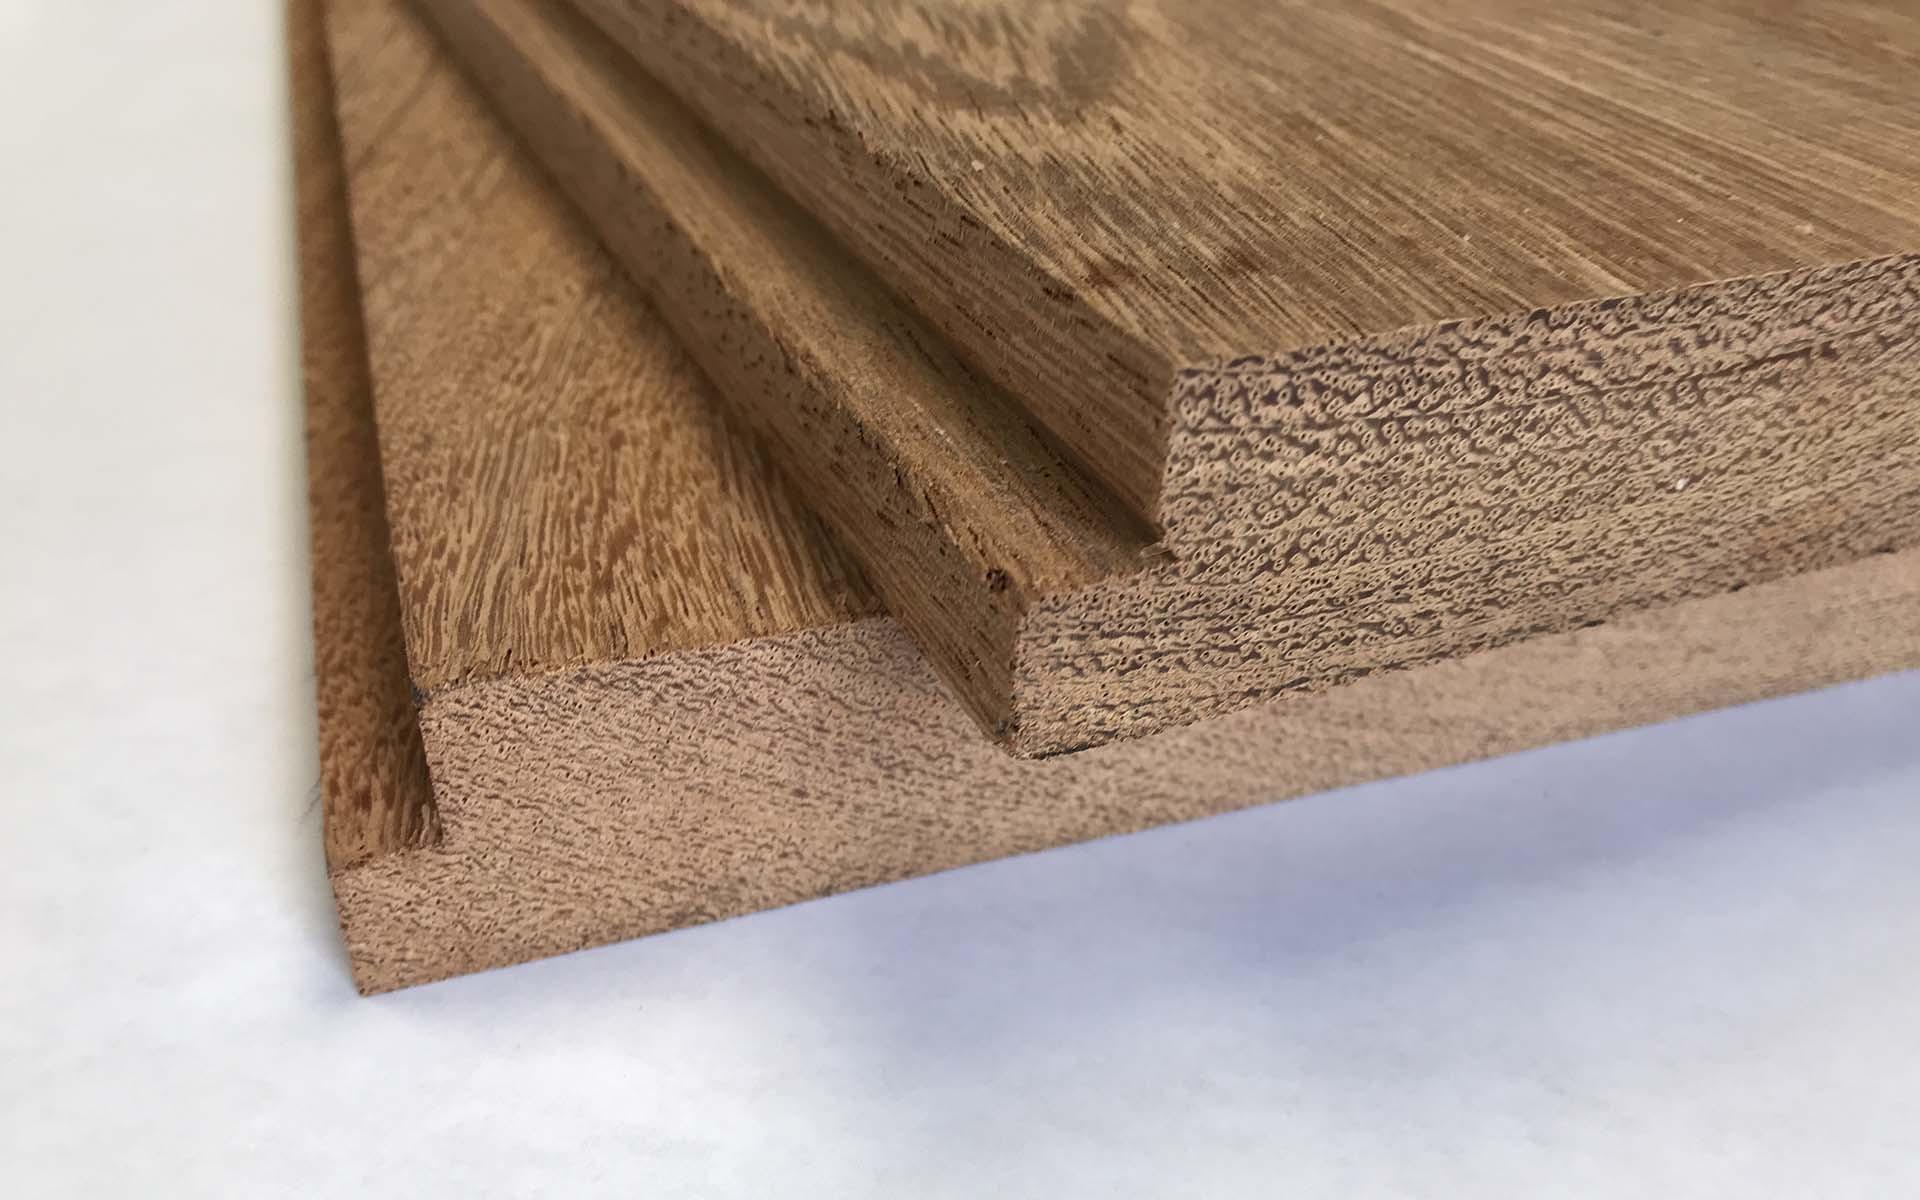 hardwood floor refinishing in tampa of buy trailer decking apitong shiplap rough boards truck flooring in 3 angelim pedra shiplap close up